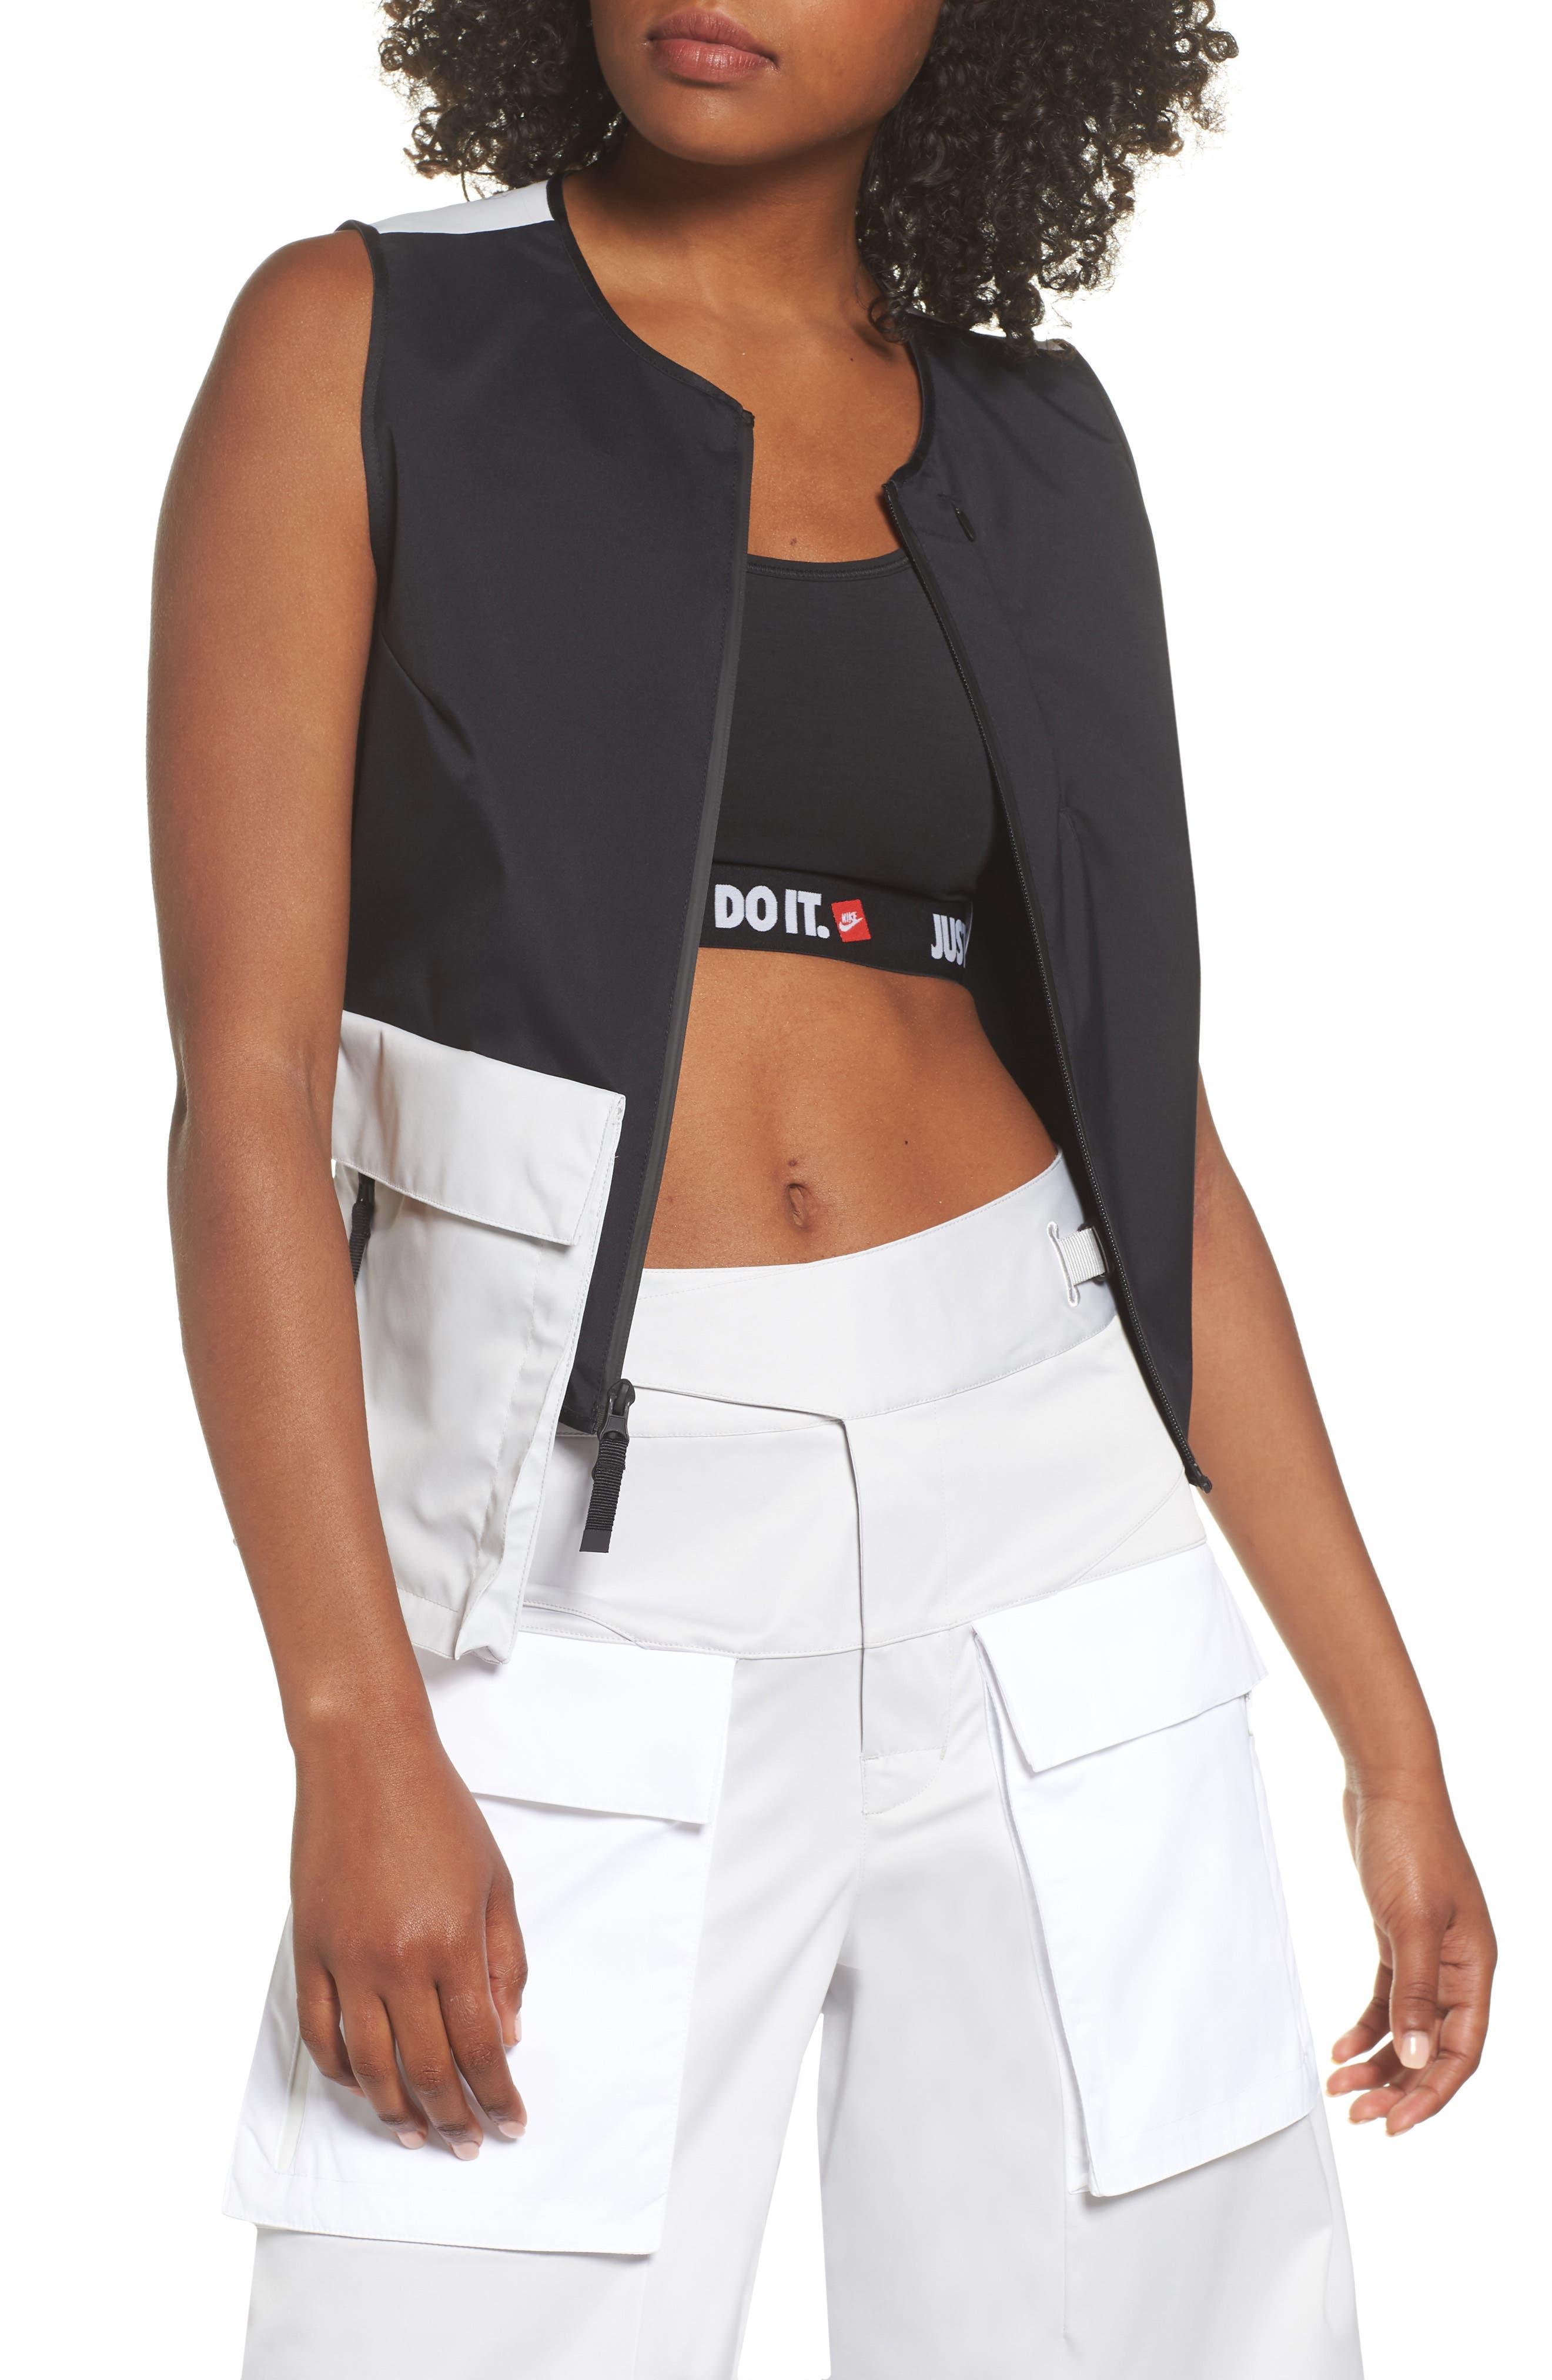 NRG Women's Utility Vest,                         Main,                         color, BLACK/ VAPOR GREEN/ BLACK